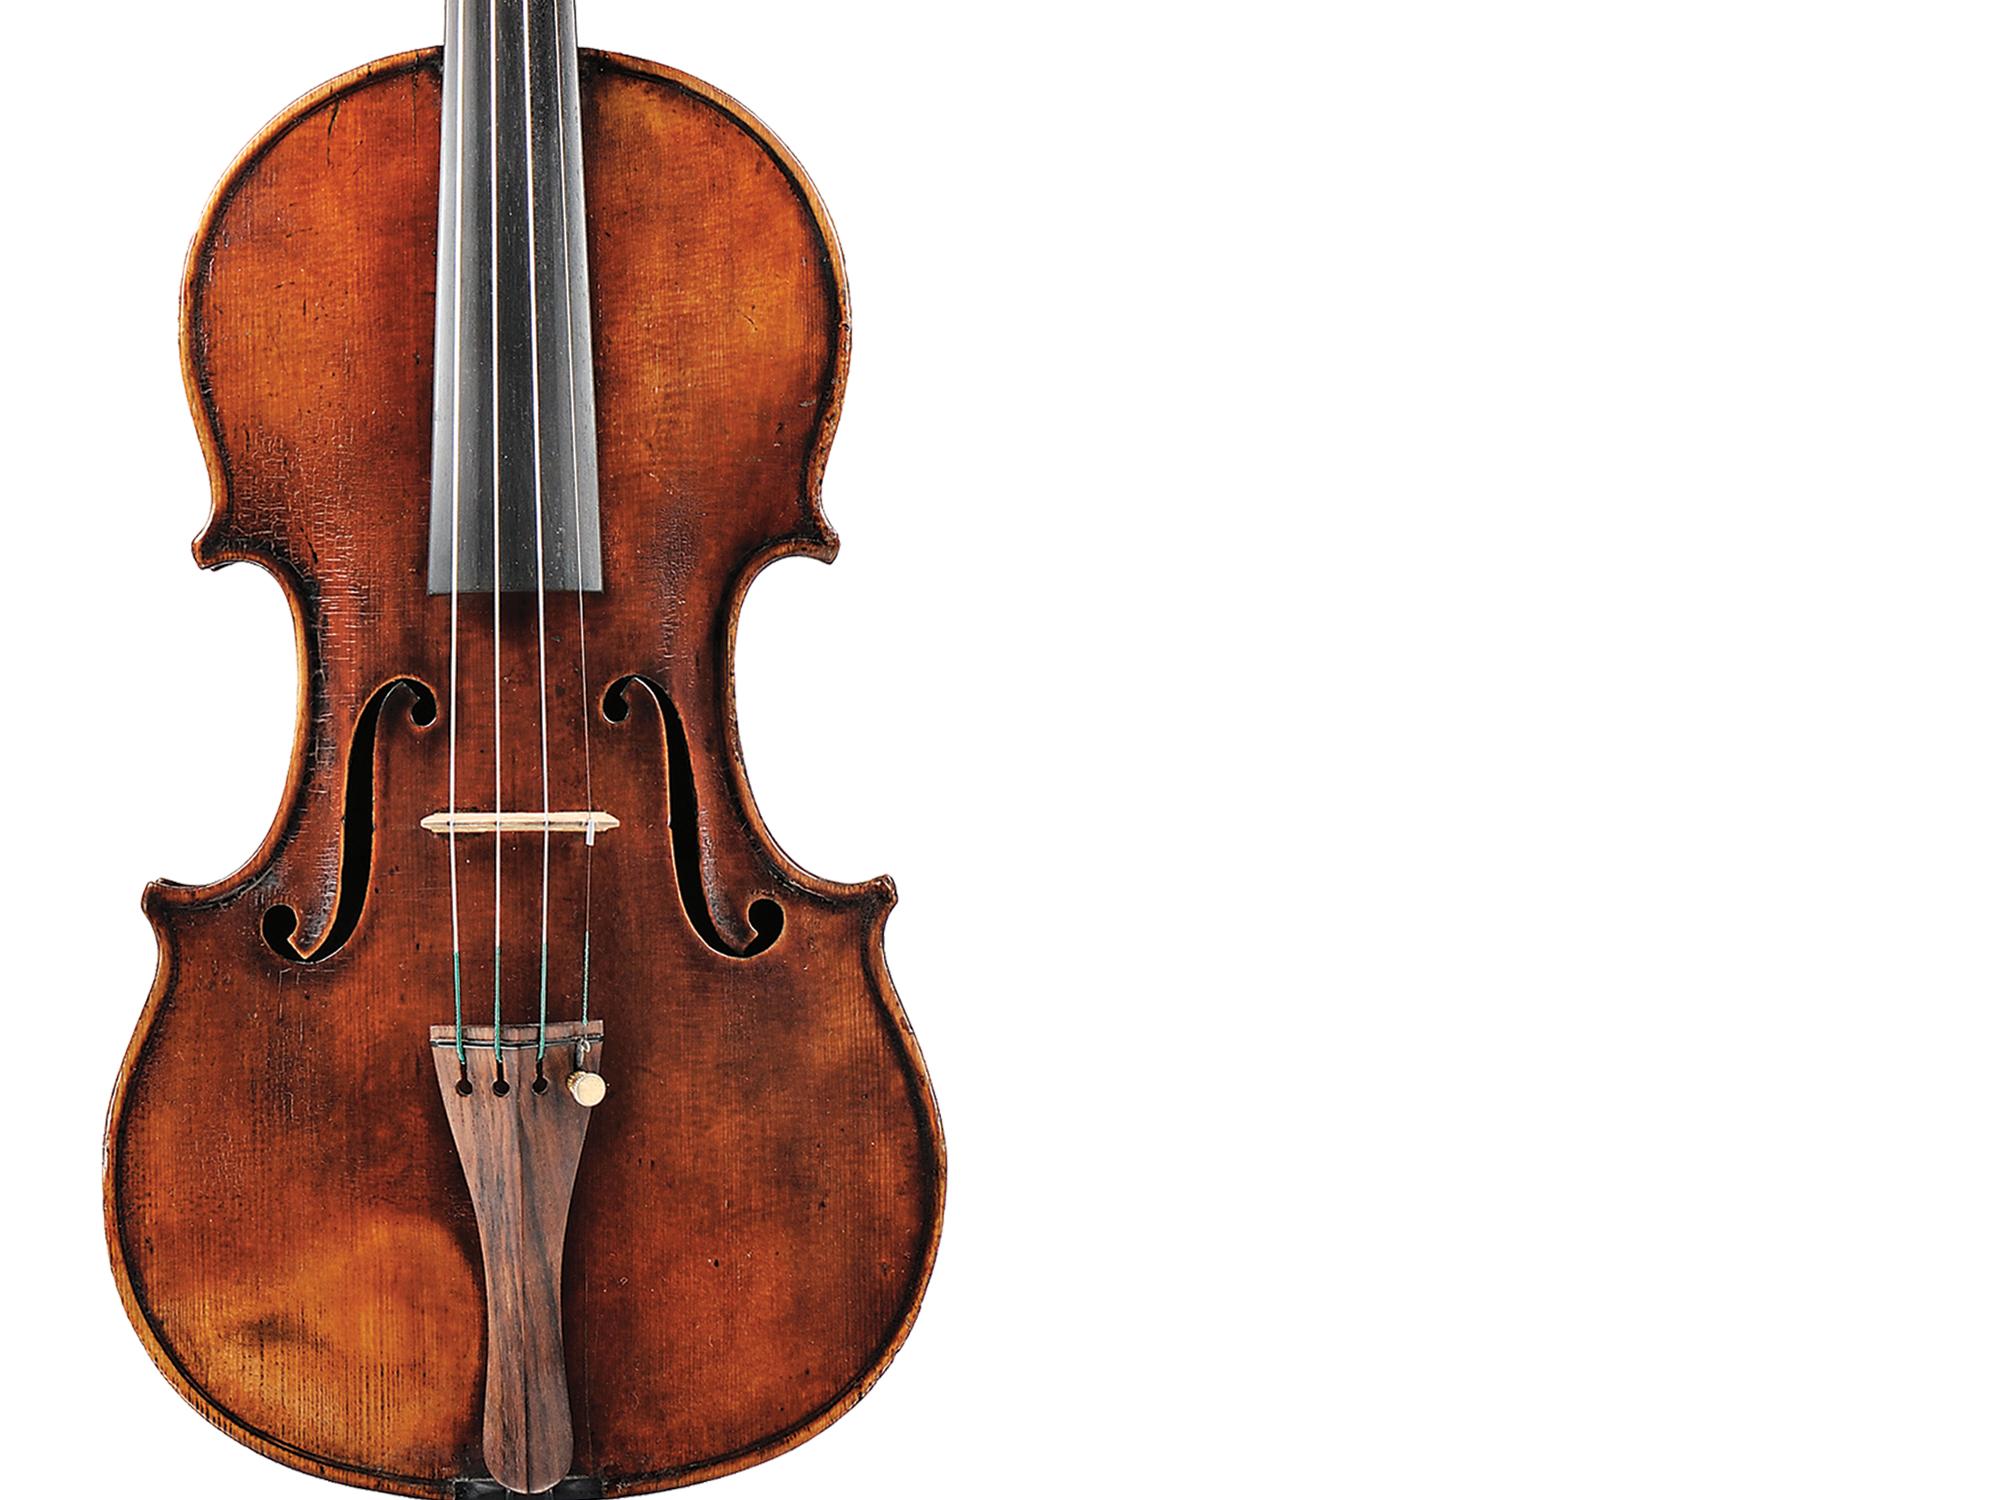 Italian Violin, Joannes Franciscus Pressenda